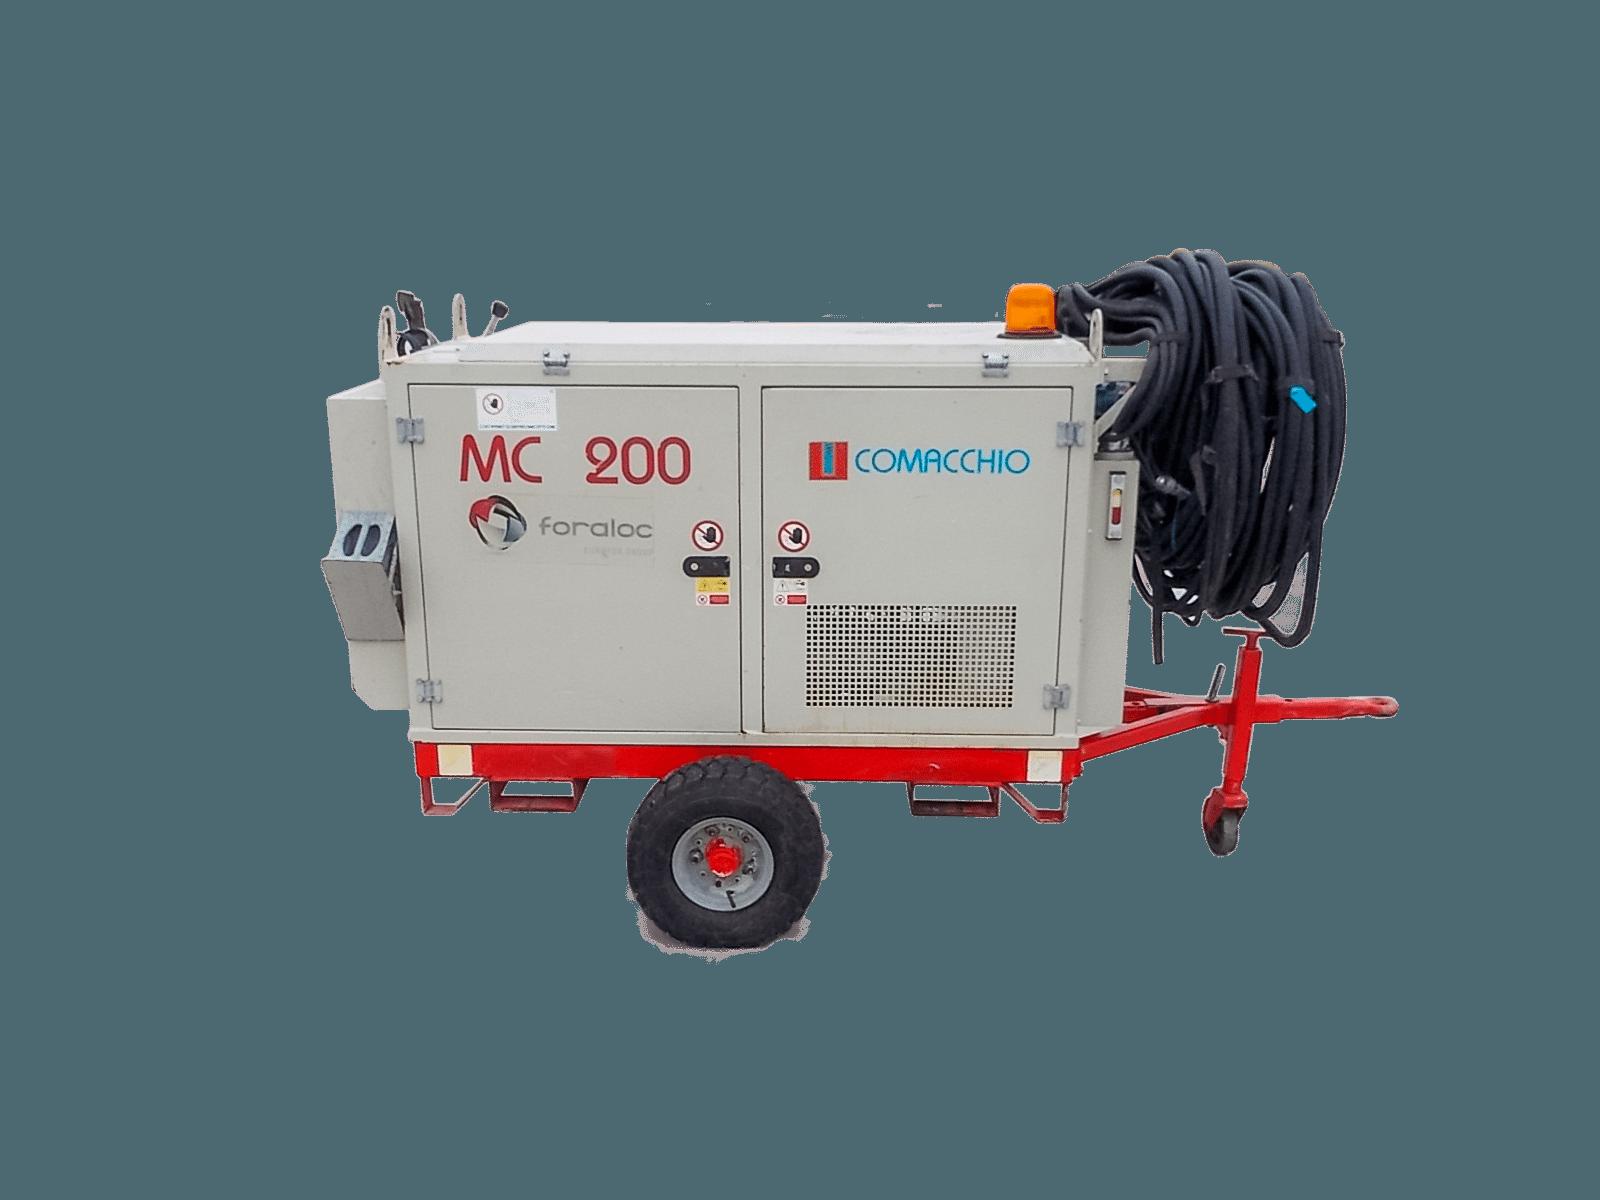 Foreuse MC200 Moteur Ther Comacchio